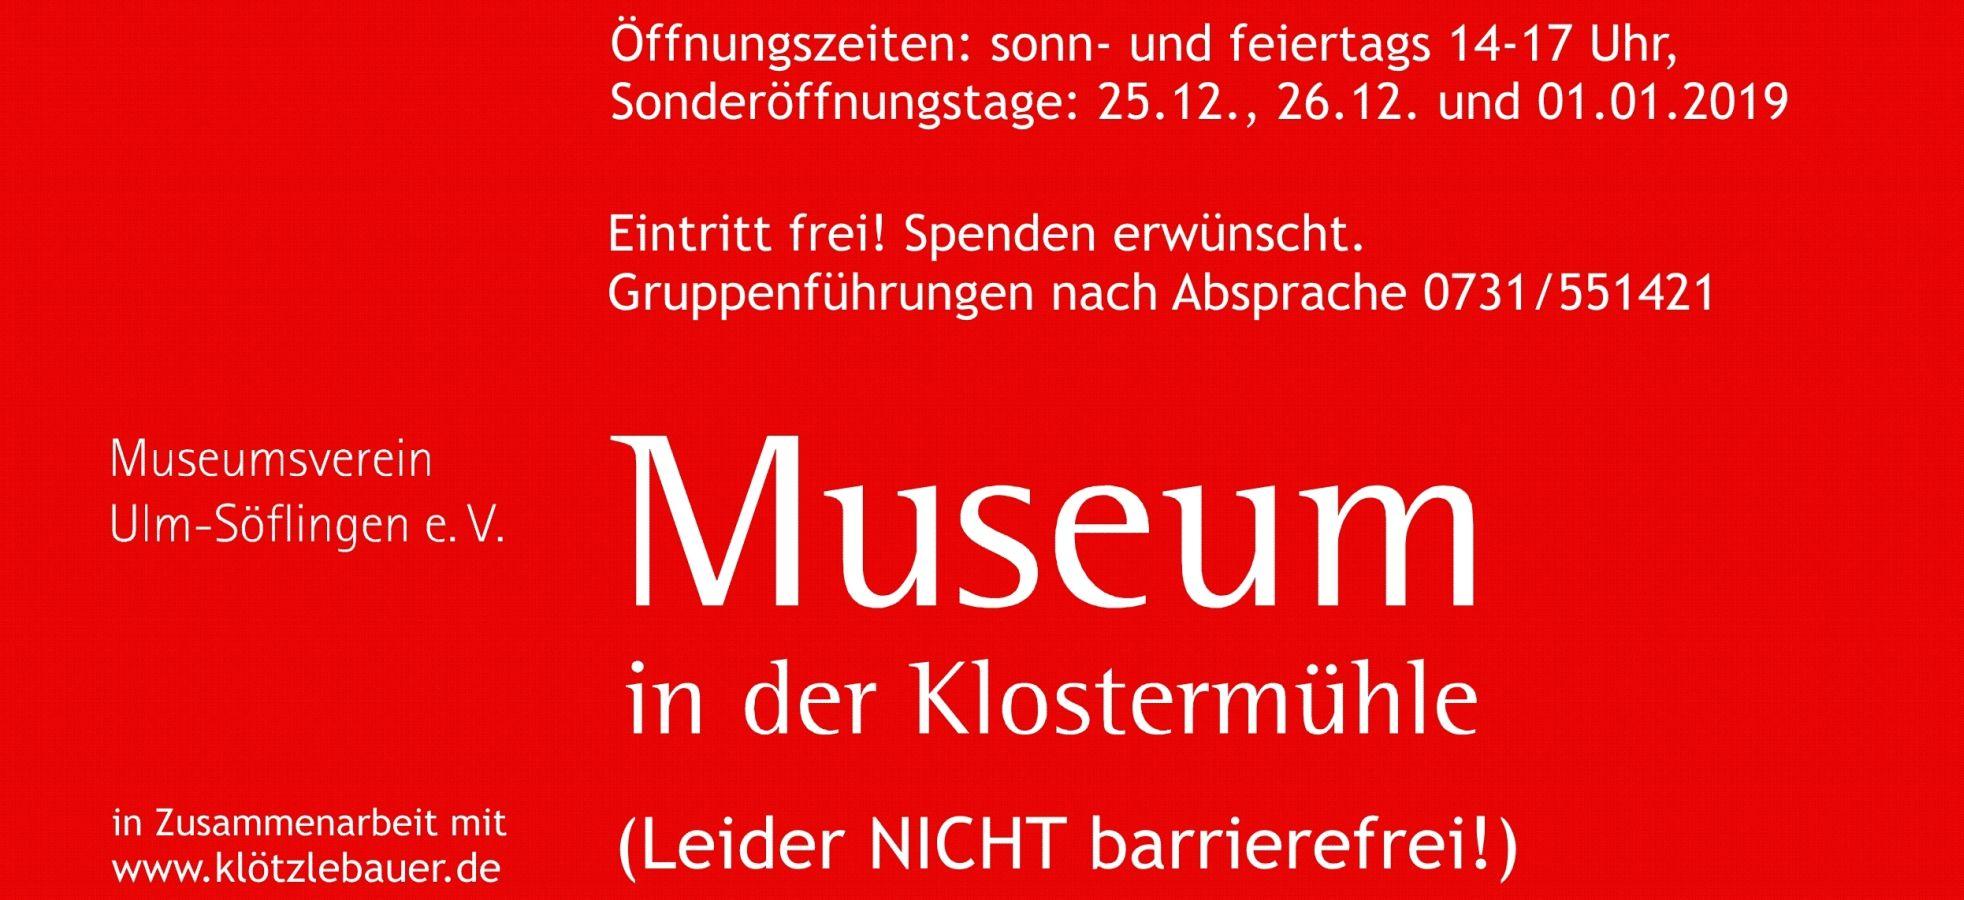 Museum-Lego-Bild3.jpg